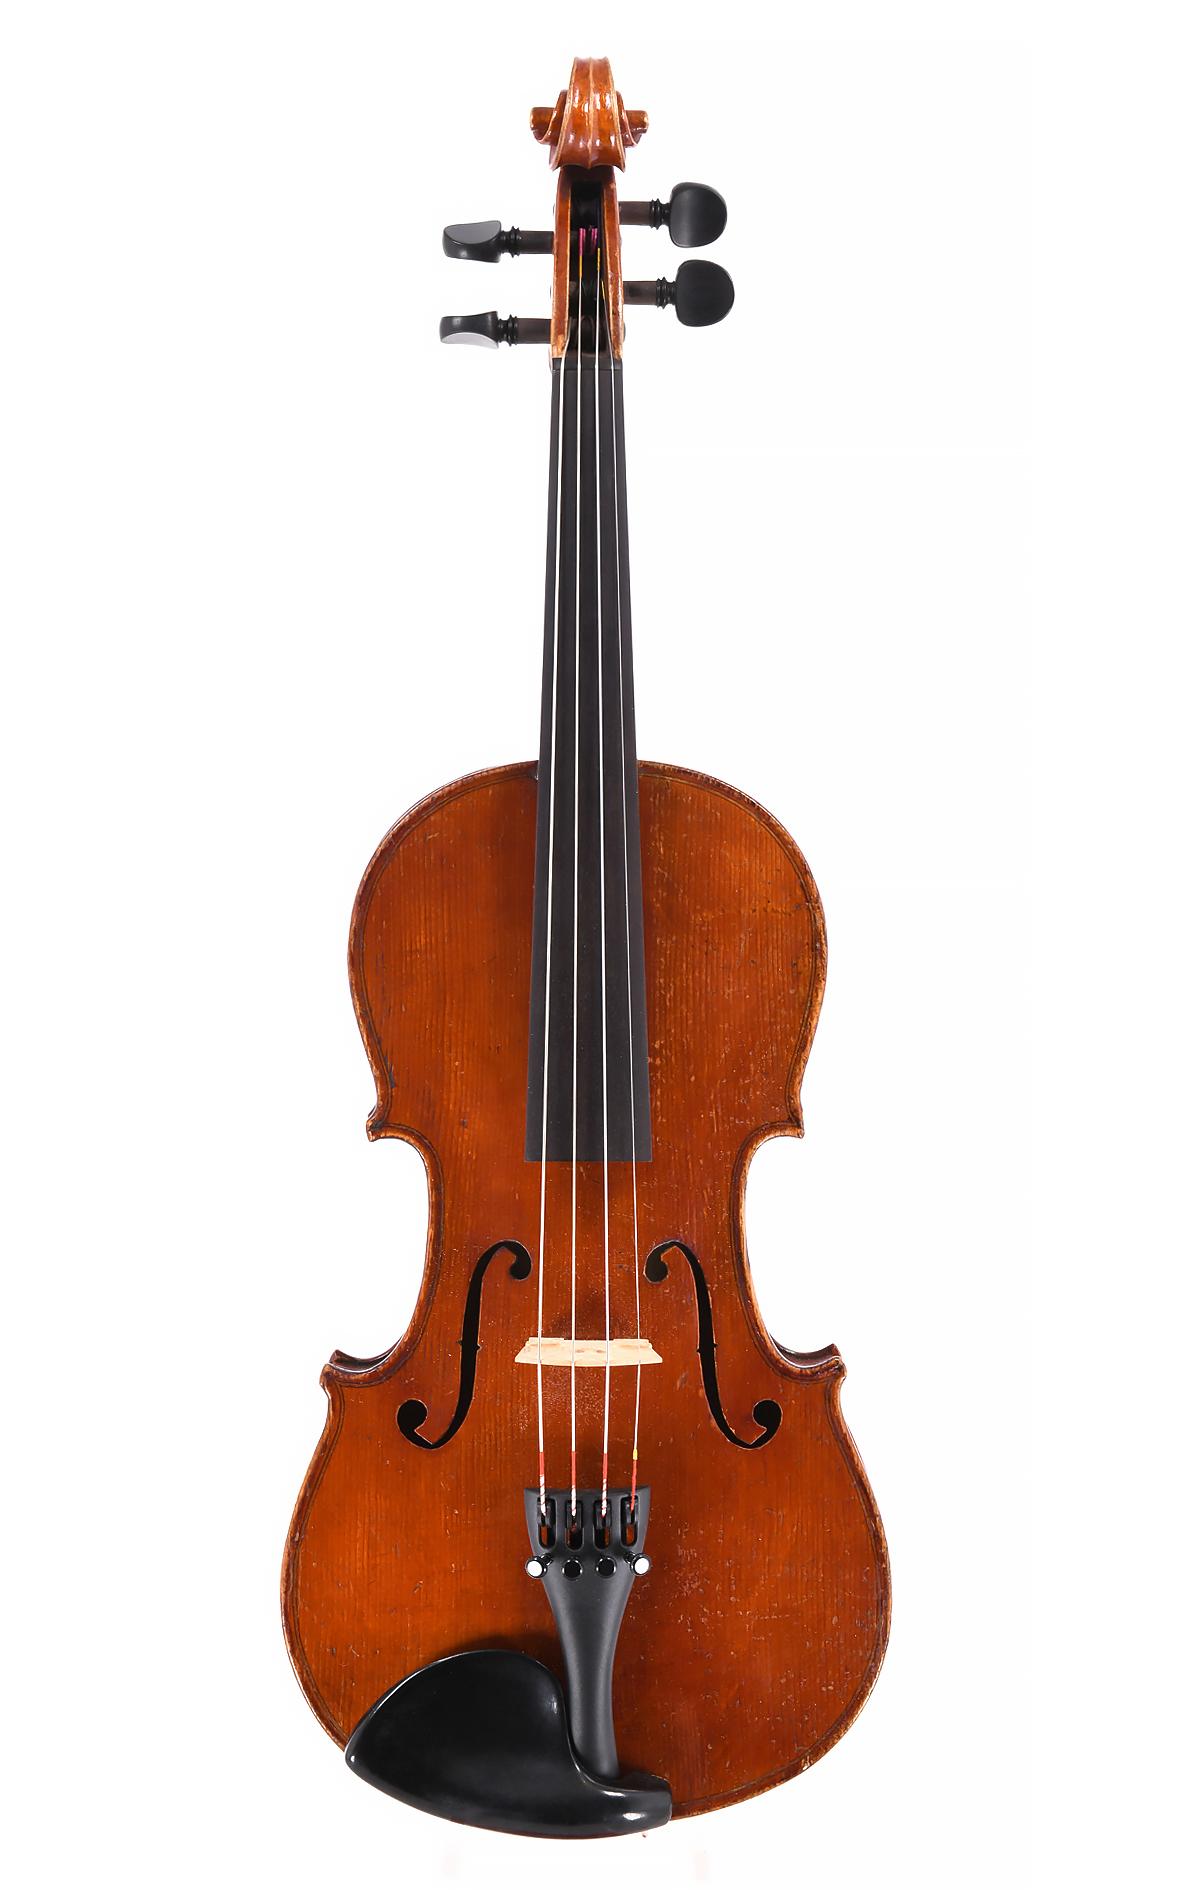 sale antique german 3 4 violin from mittenwald children 39 s violins mittenwald unknown. Black Bedroom Furniture Sets. Home Design Ideas